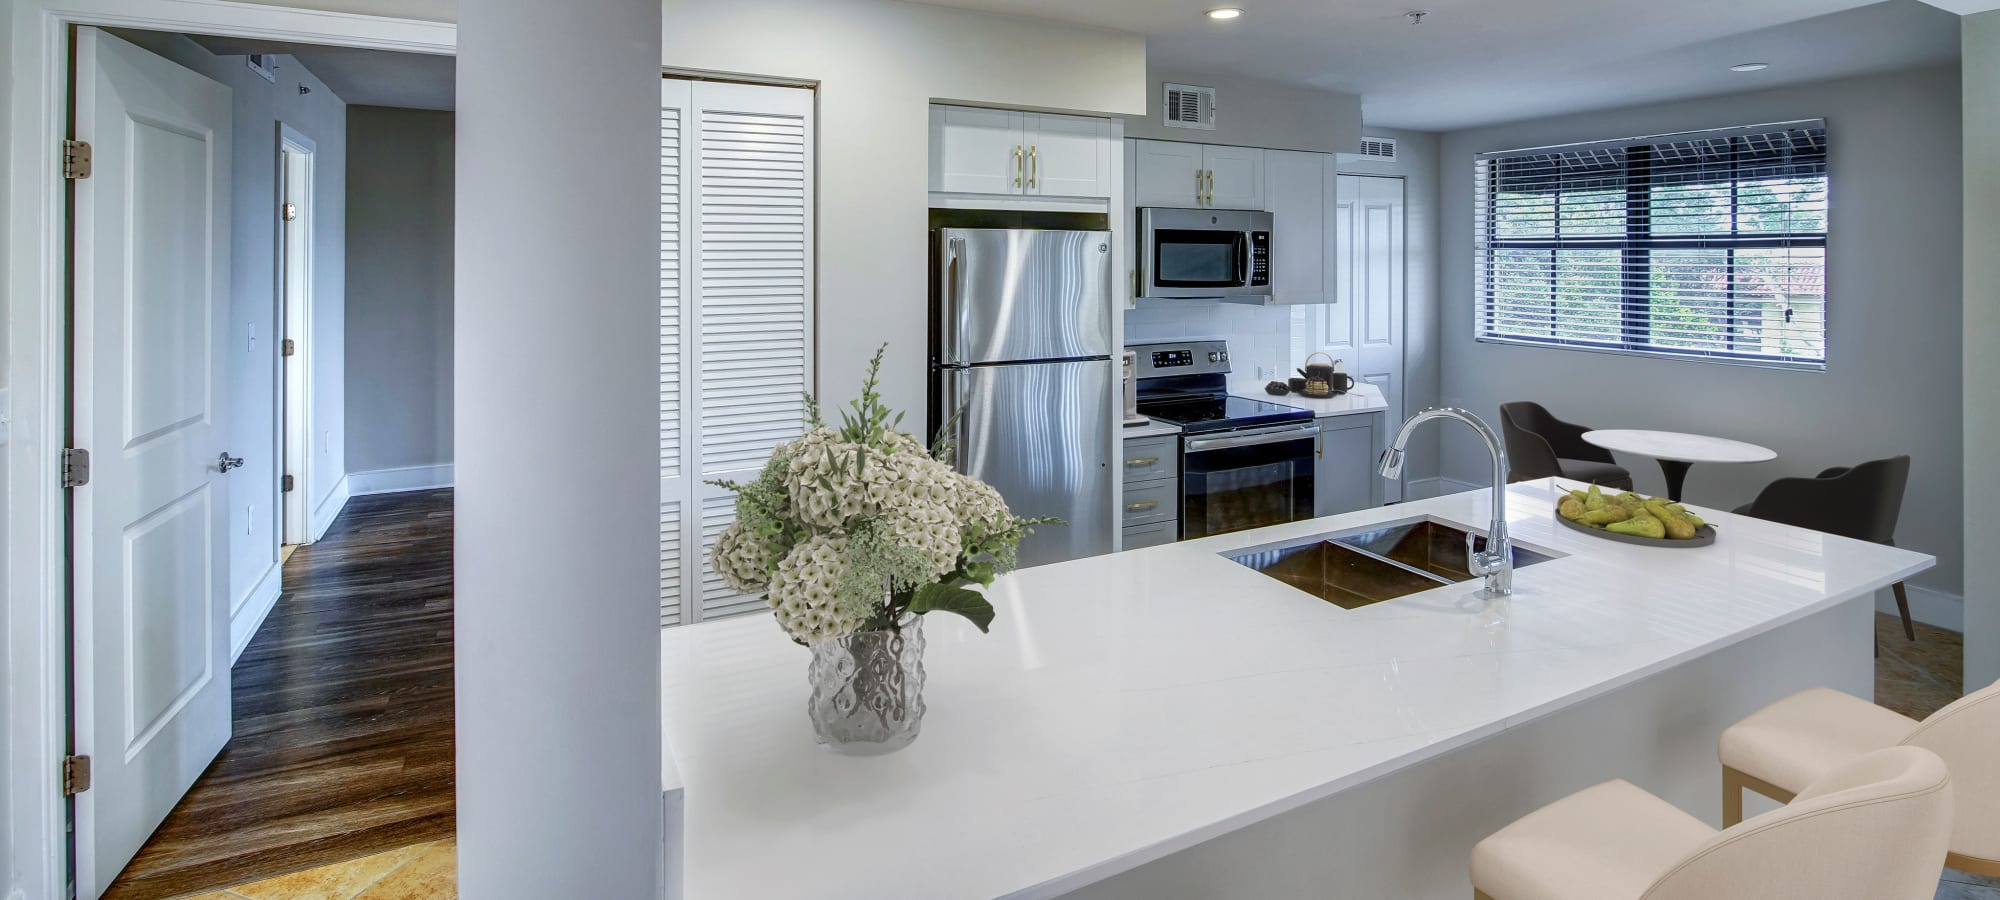 Apartments at The Heritage at Boca Raton in Boca Raton, Florida